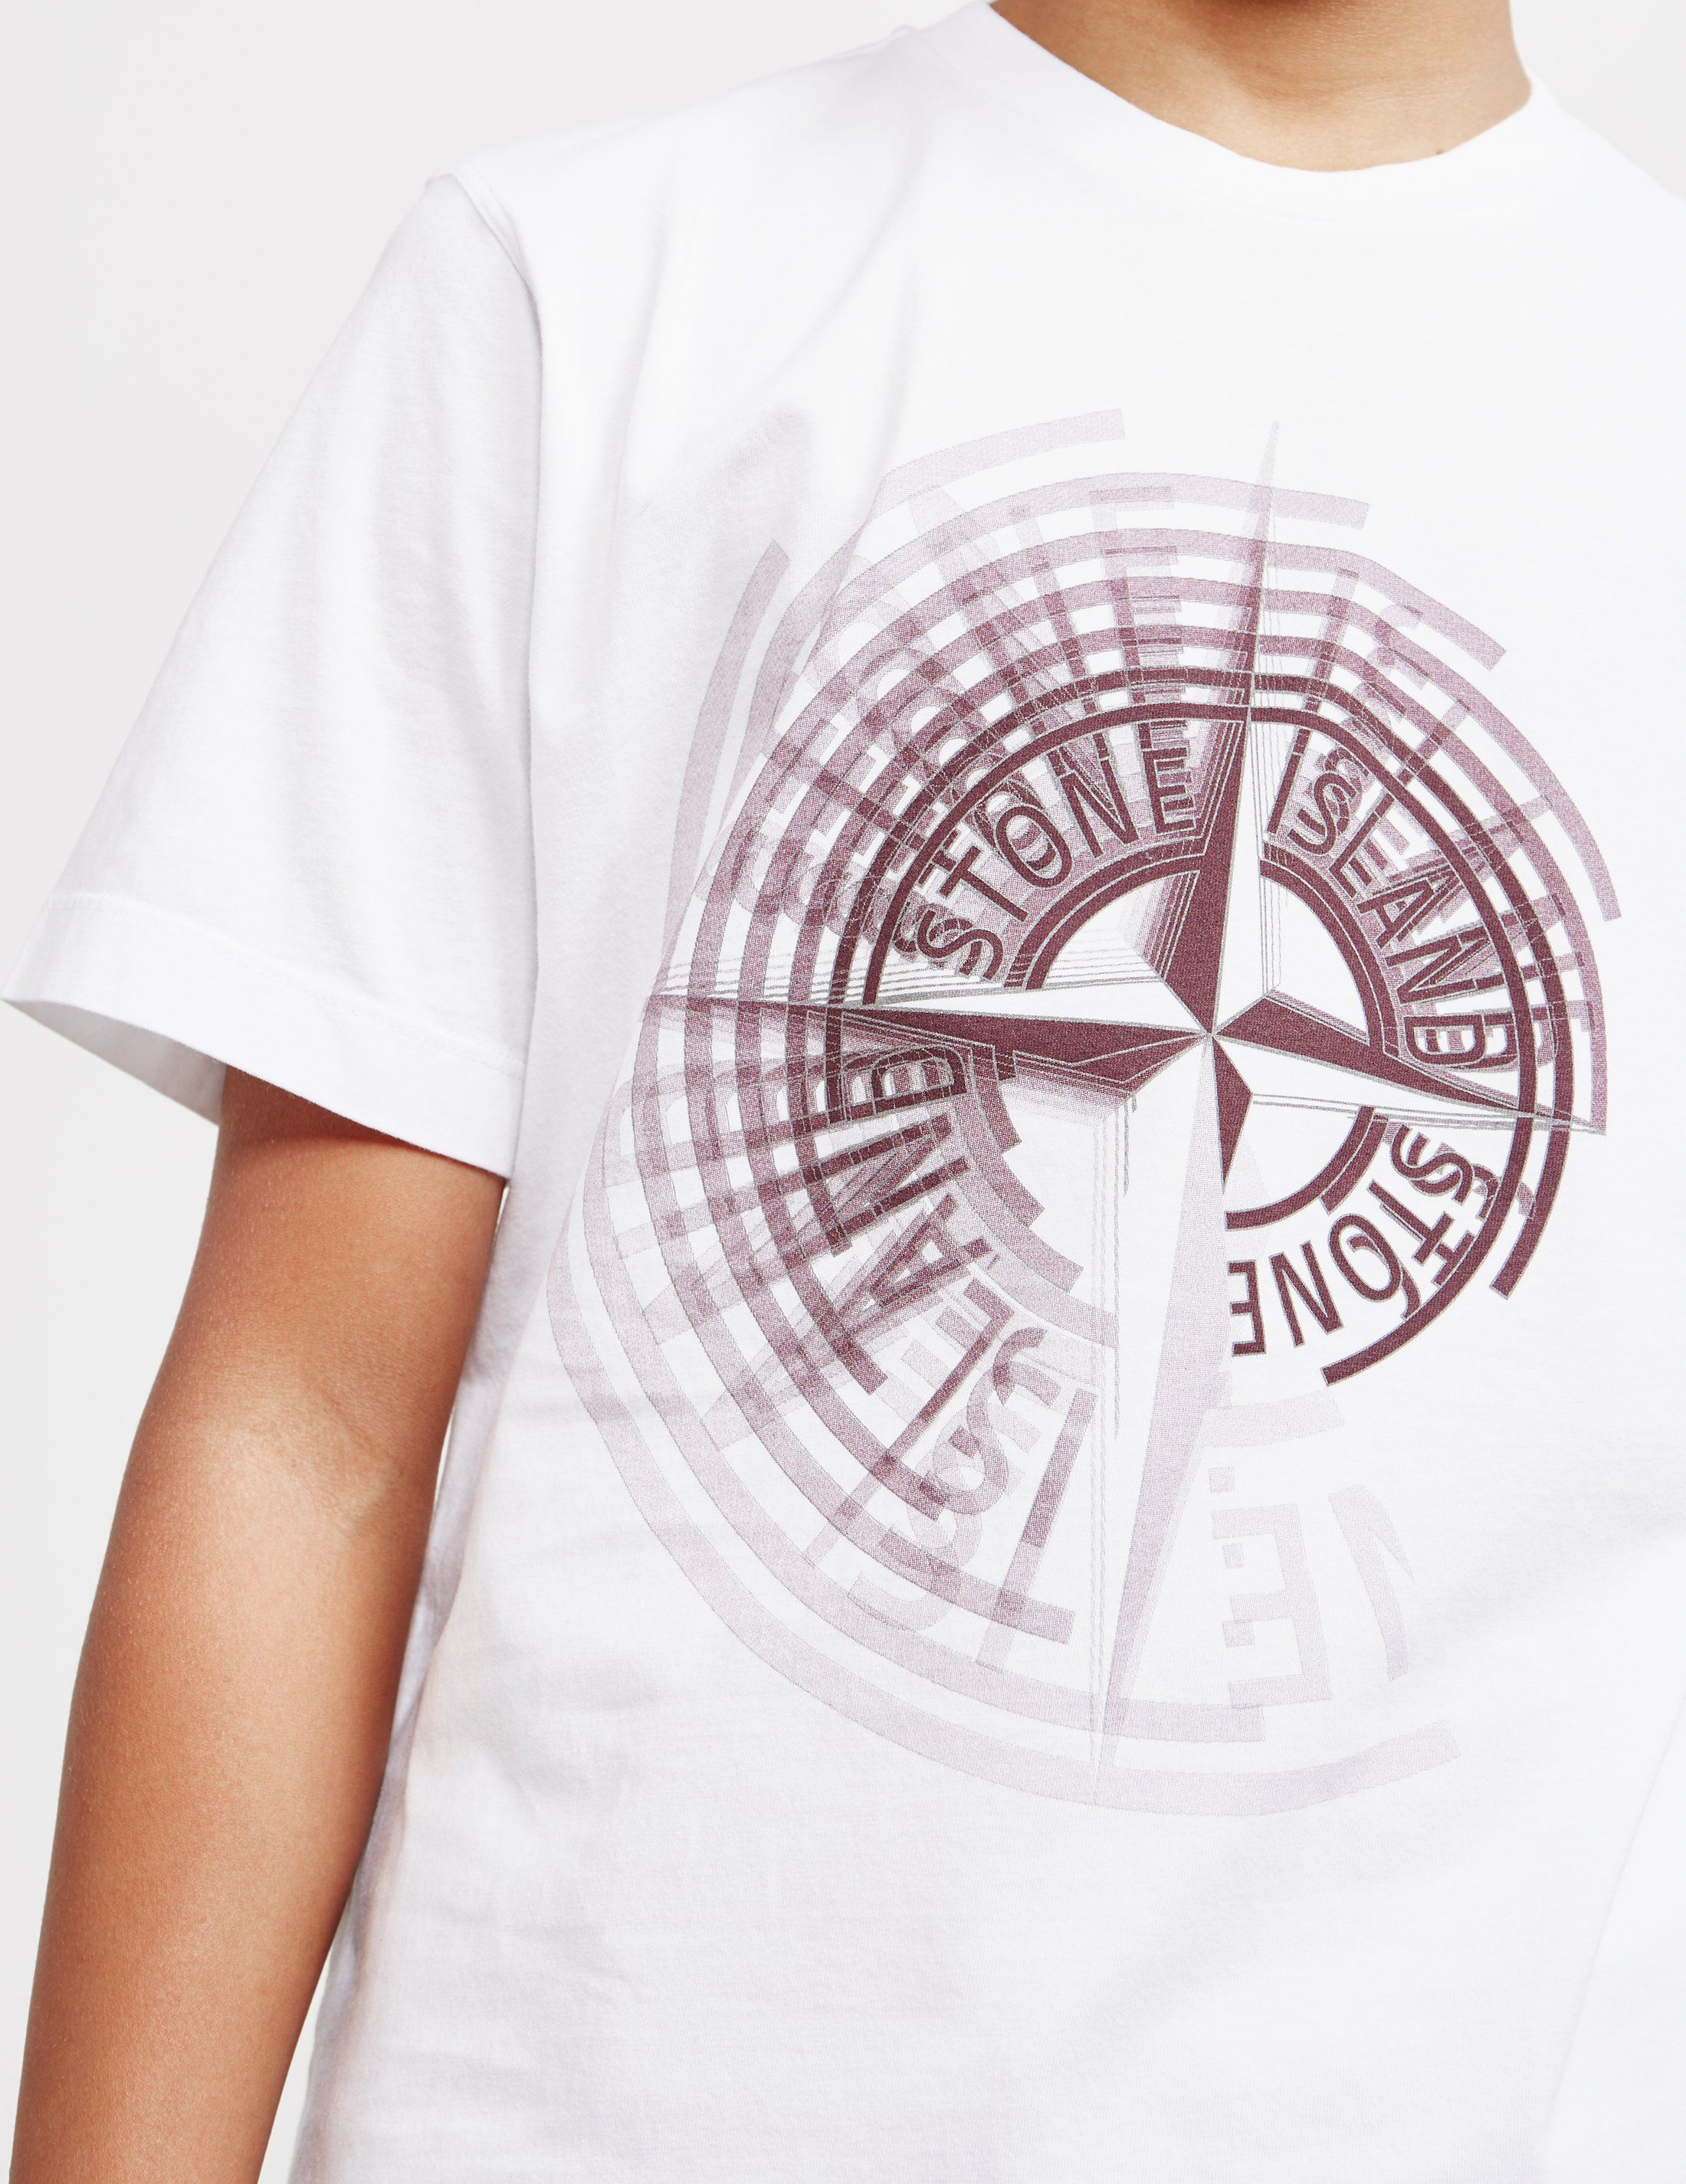 Stone Island Large Pin Short Sleeve T-Shirt